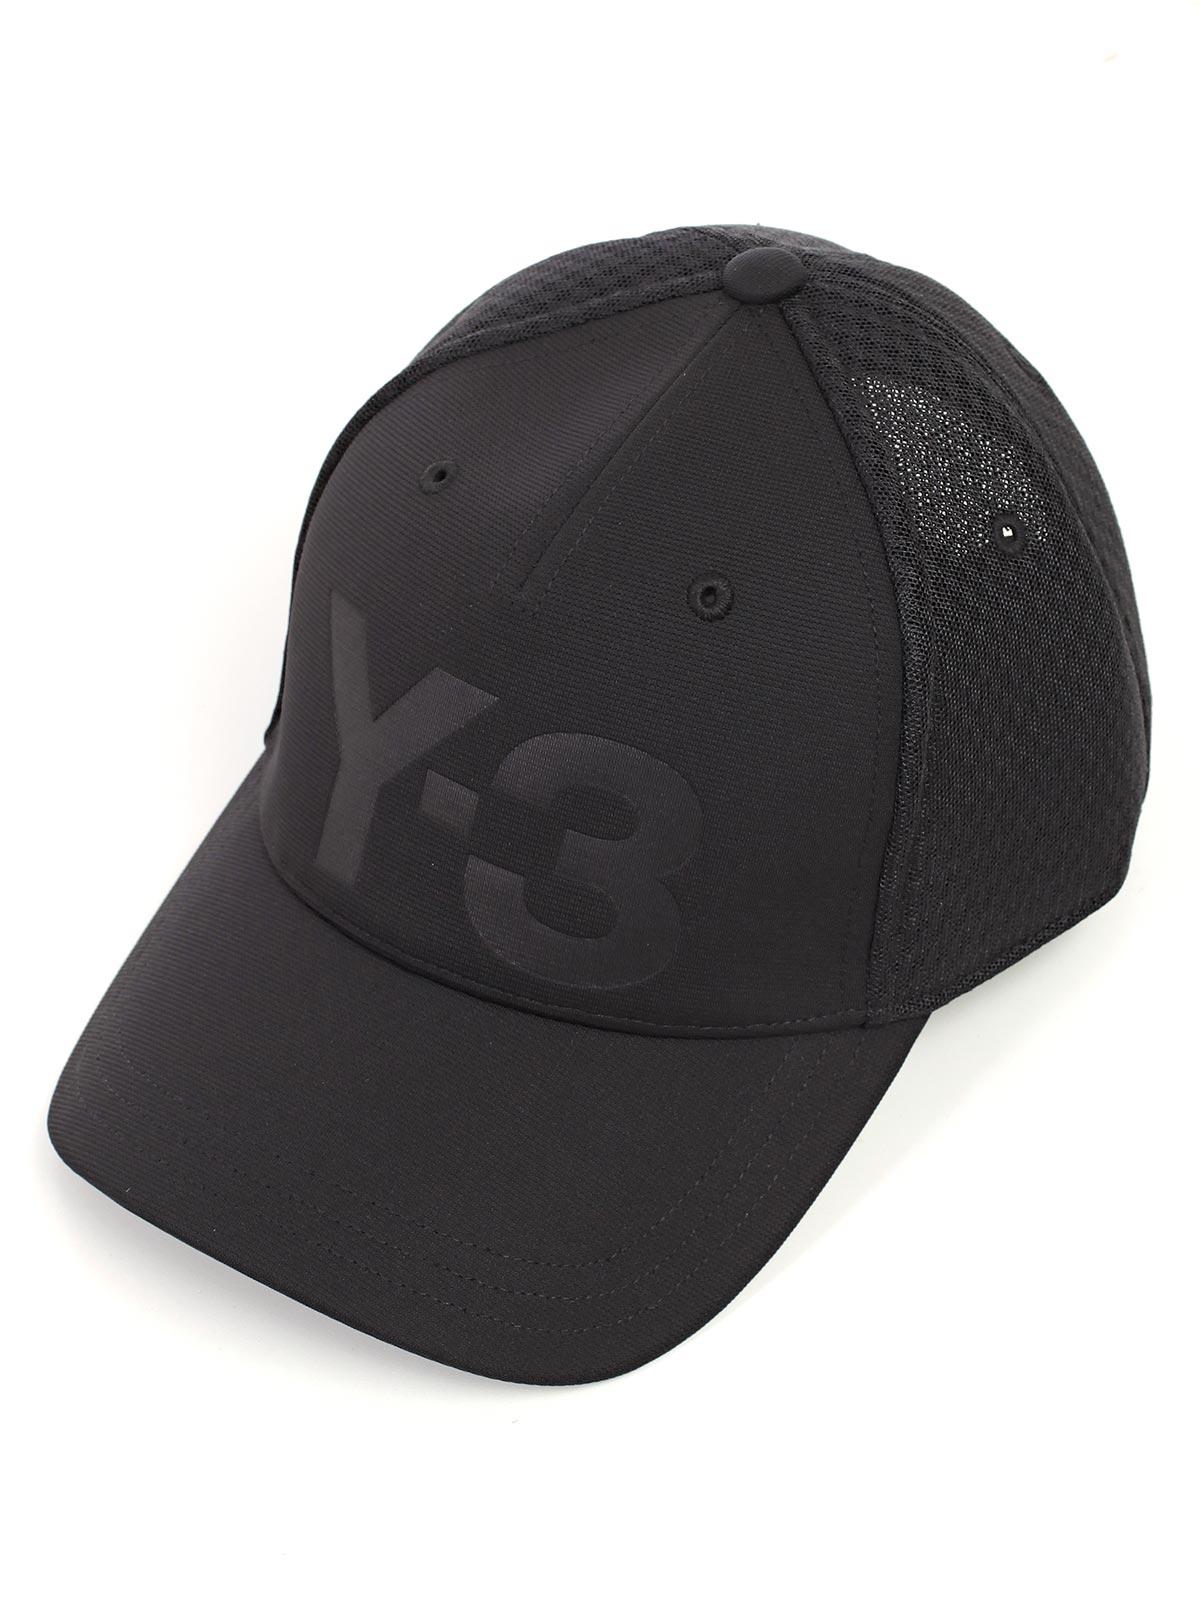 Picture of Y-3 Yohji Yamamoto Adidas  Hat